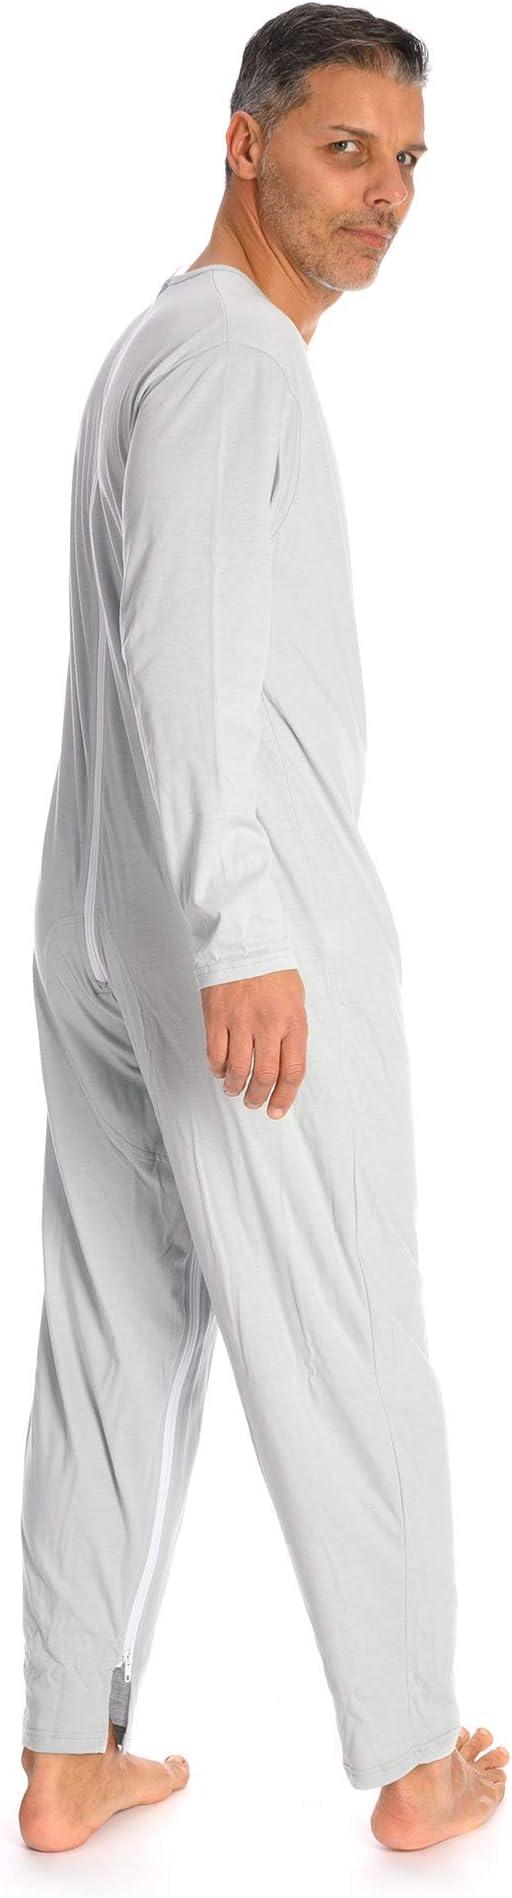 Rekordsan Pijama Antipañal Geriátrico Ideal Hombre en Fresco Algodón con 2 Cremalleras, Talla 2, Pack de 1